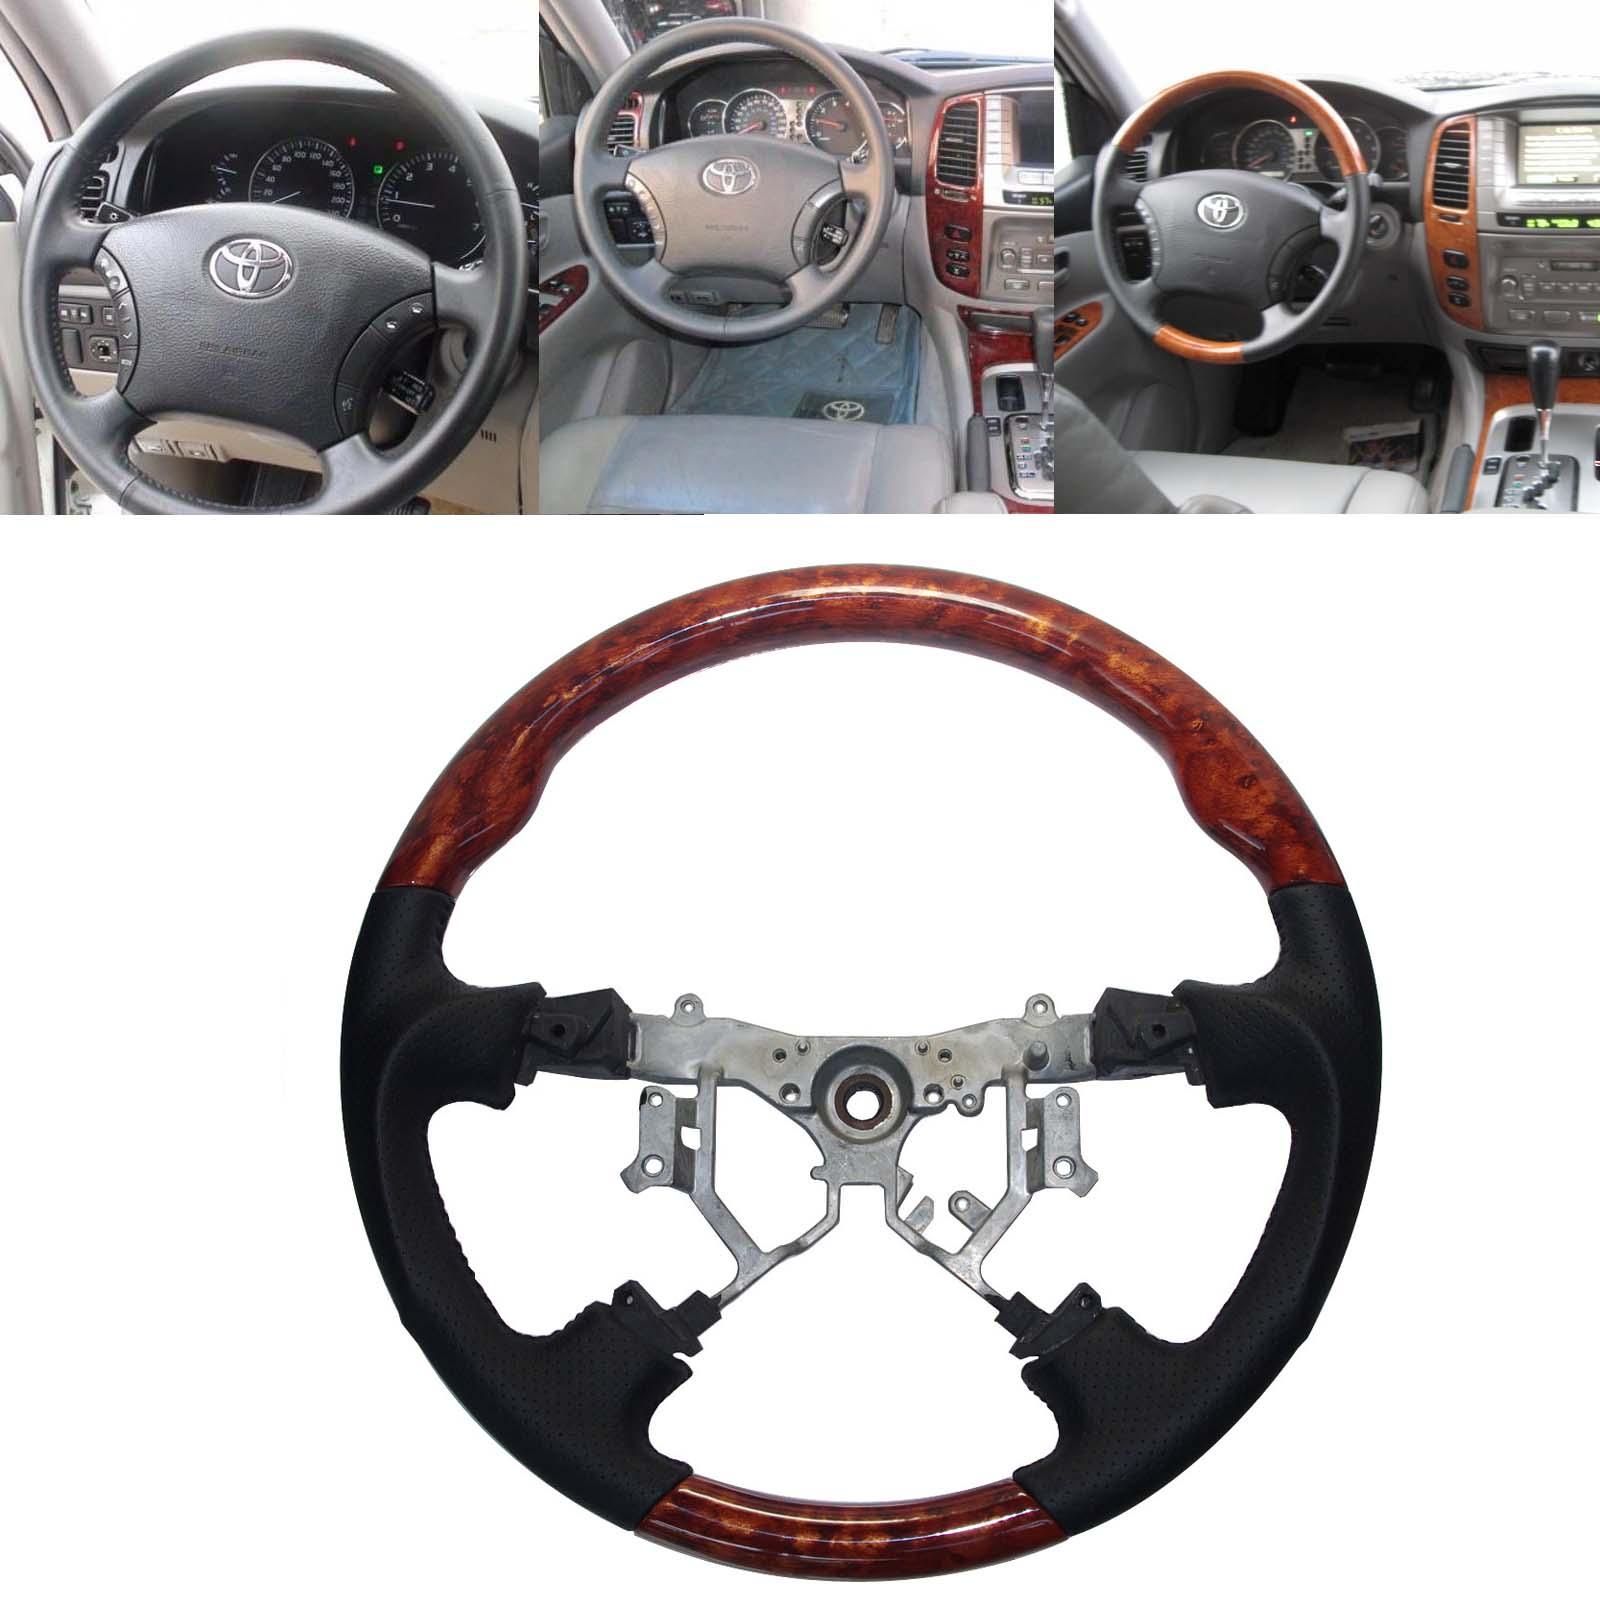 Black Leather Wood Sports Steering Wheel Compatible for 2003-2007 Toyota Land Cruiser 100 4700 FJ100 Prado FJ120 LX470 GX470 Alphard